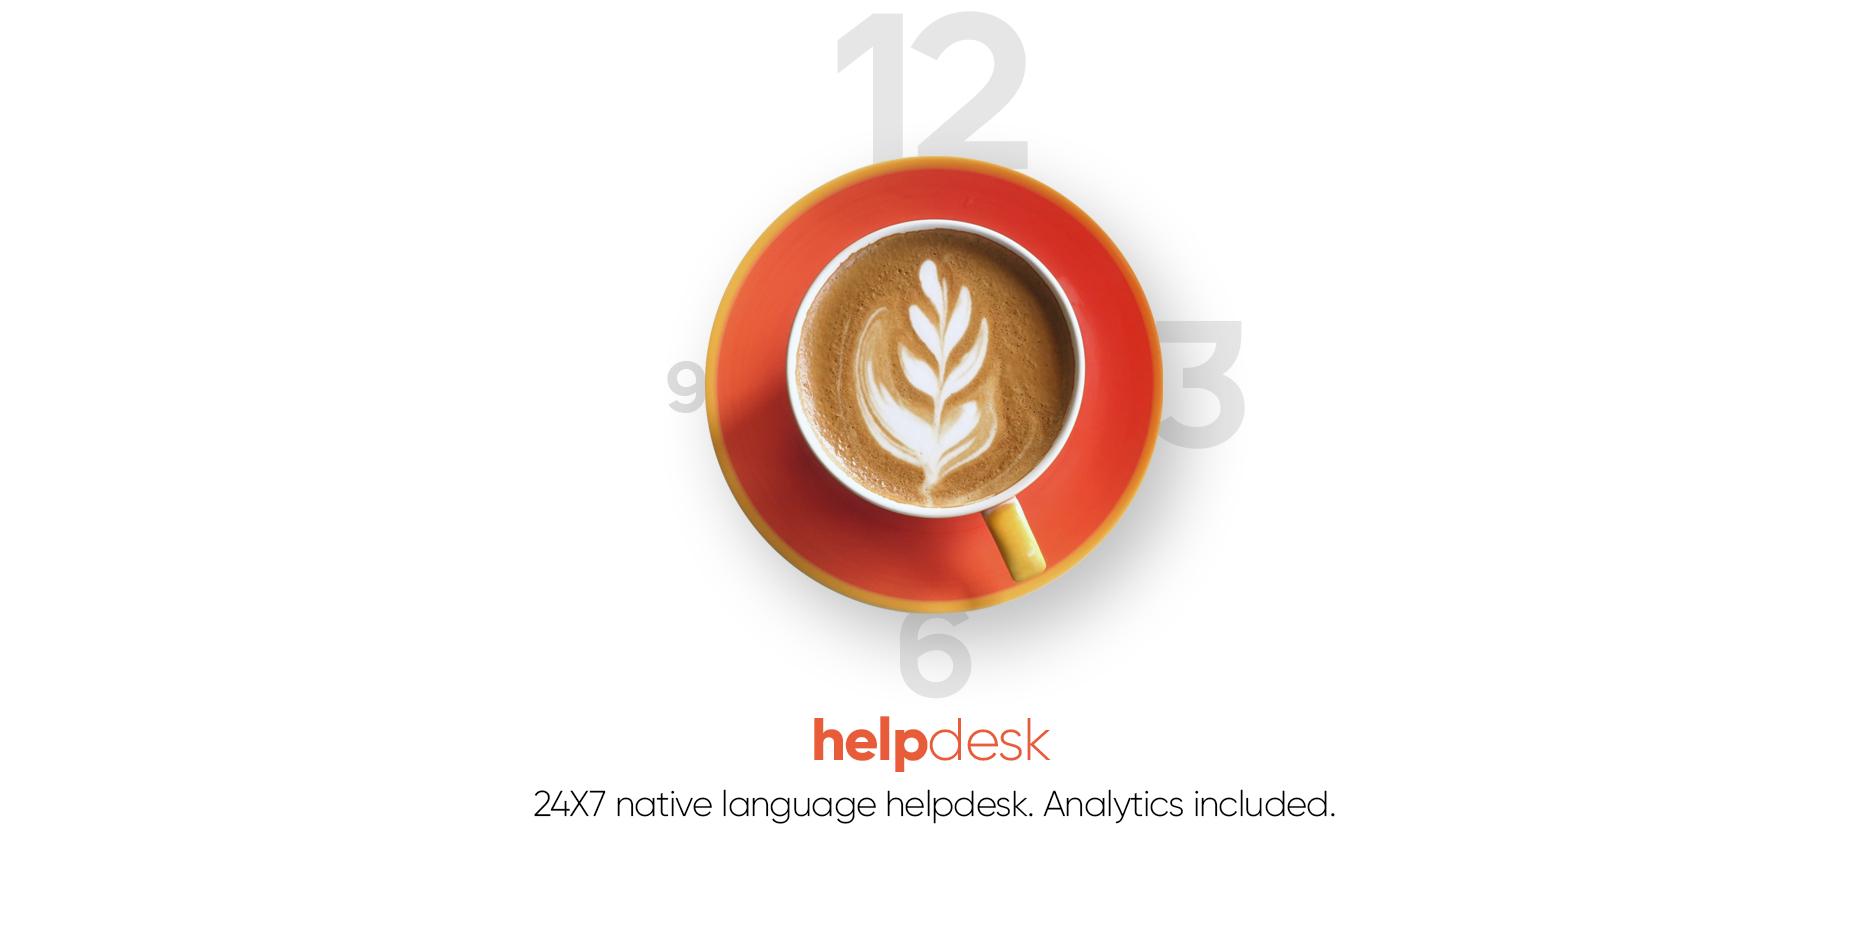 HELPDESK_05.jpg